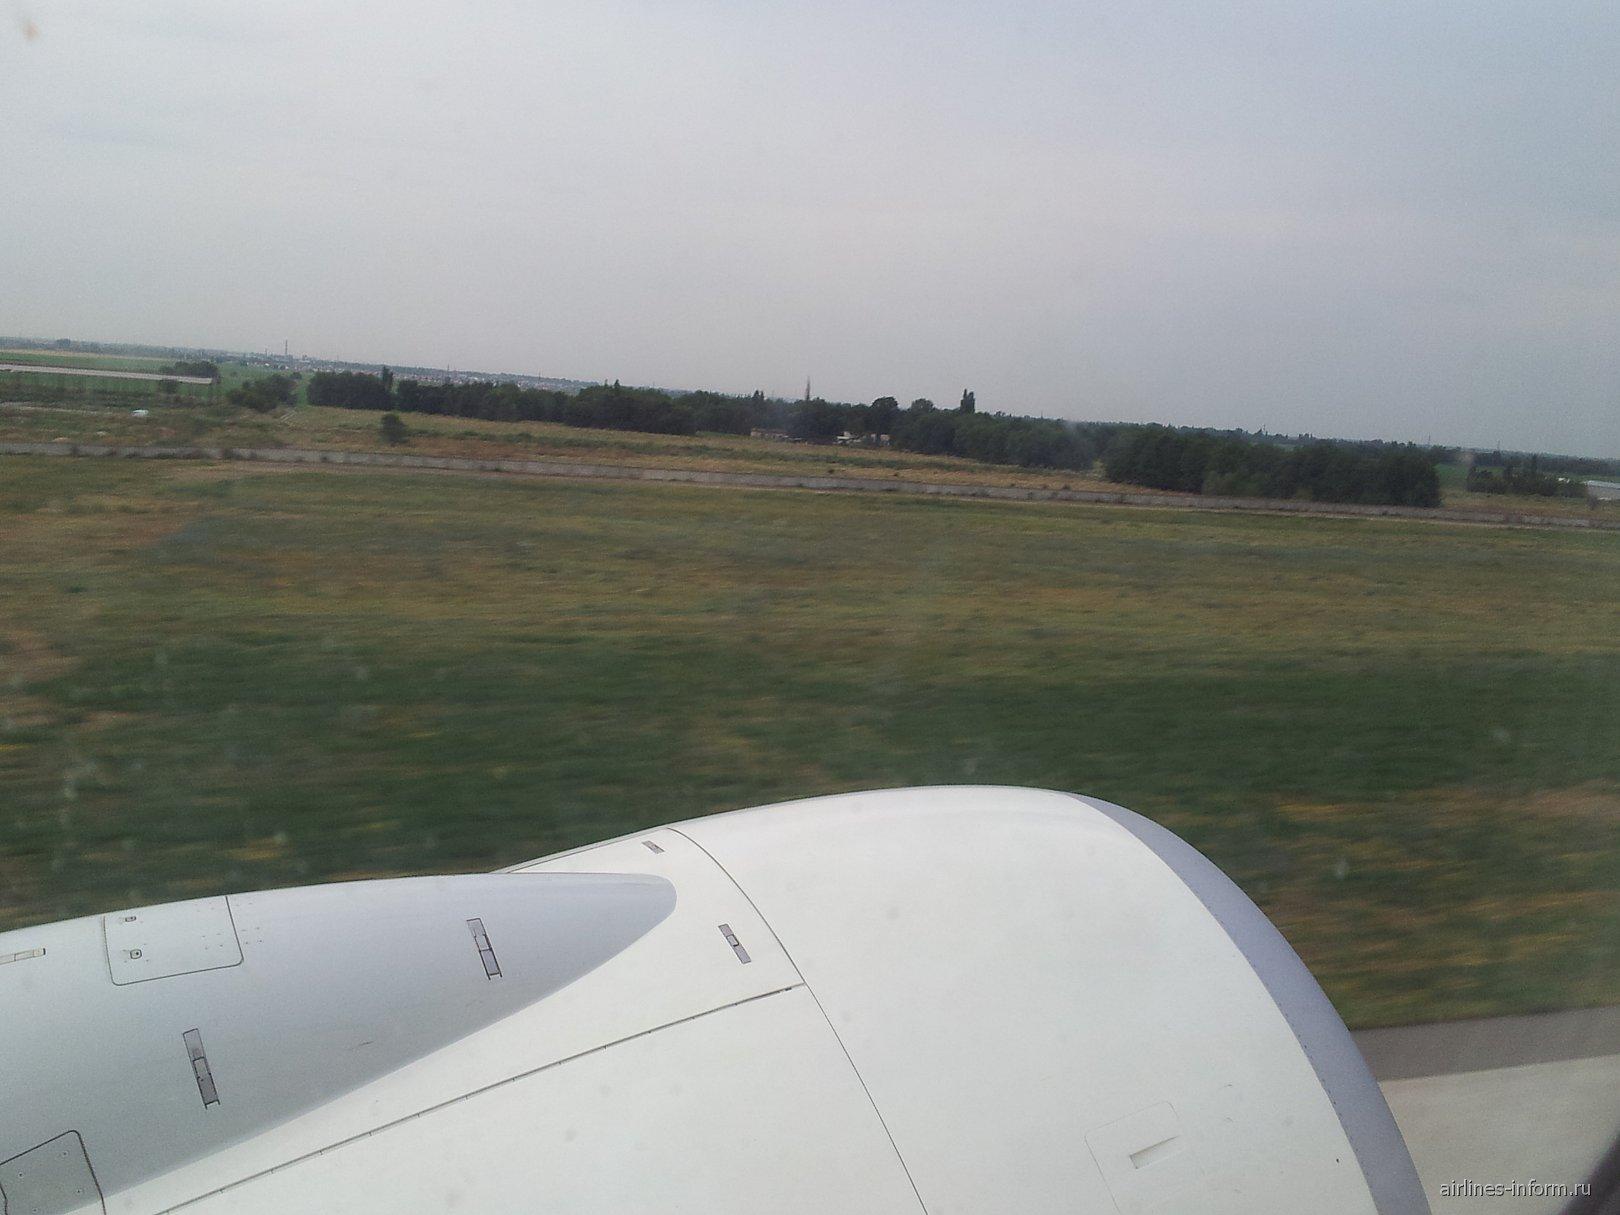 Рейс Алматы-Стамбул Турецких авиалиний